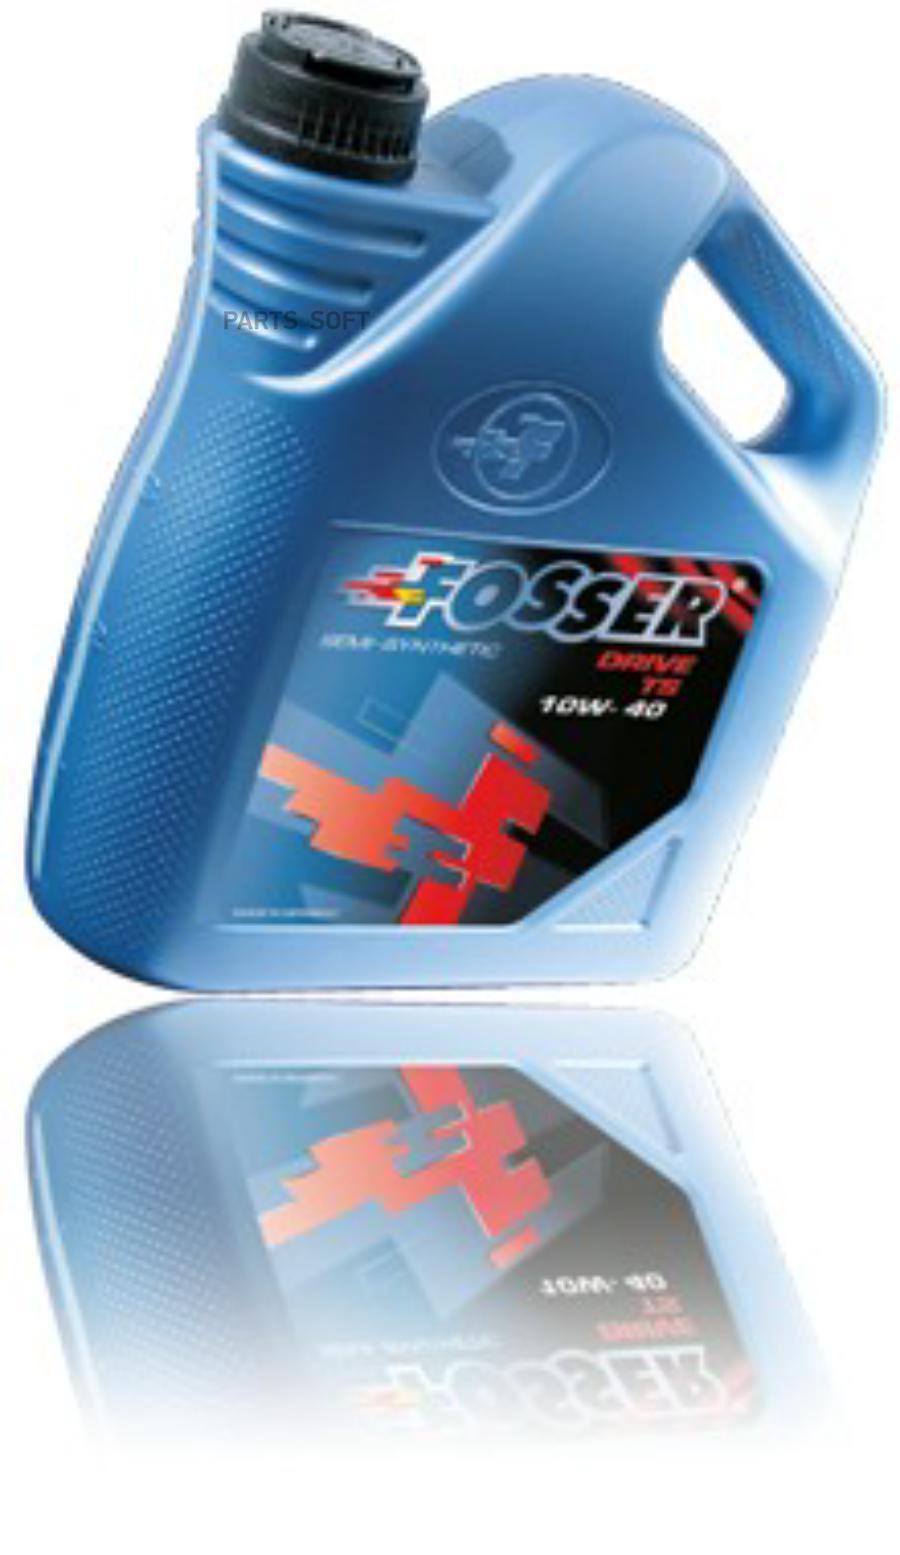 Масло моторное Fosser Drive TS 10W-40 (1л)